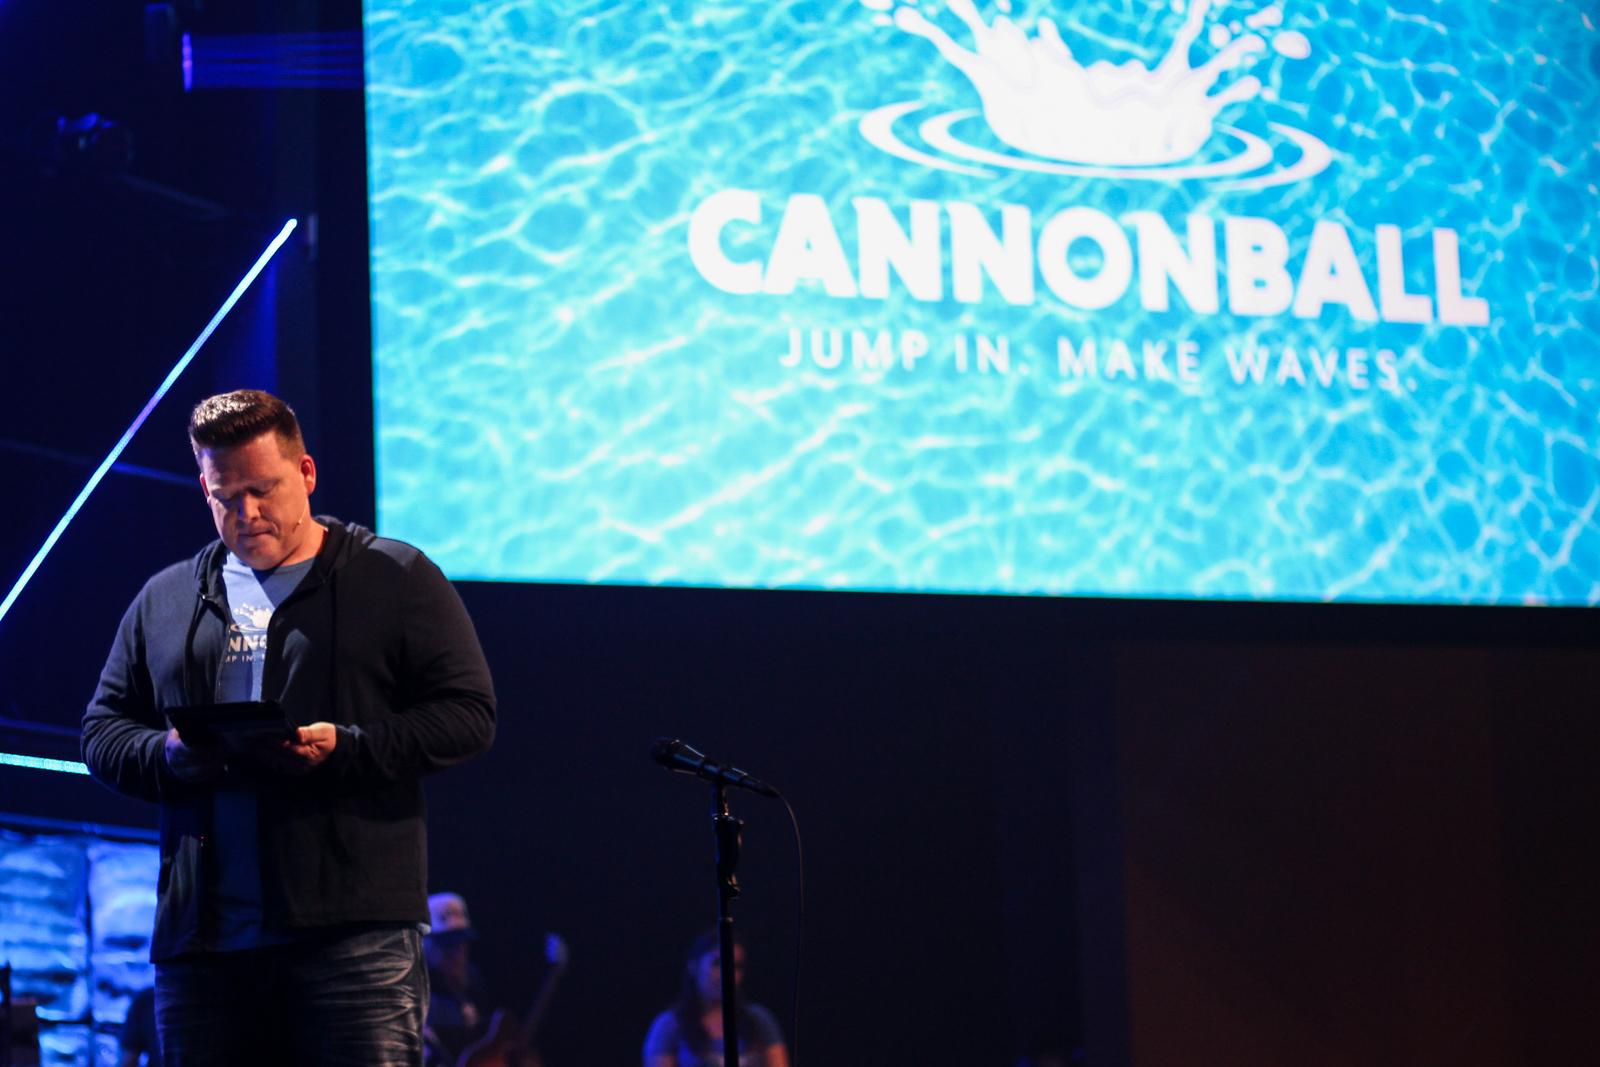 Eastlake Church Cannonball Commitment Night